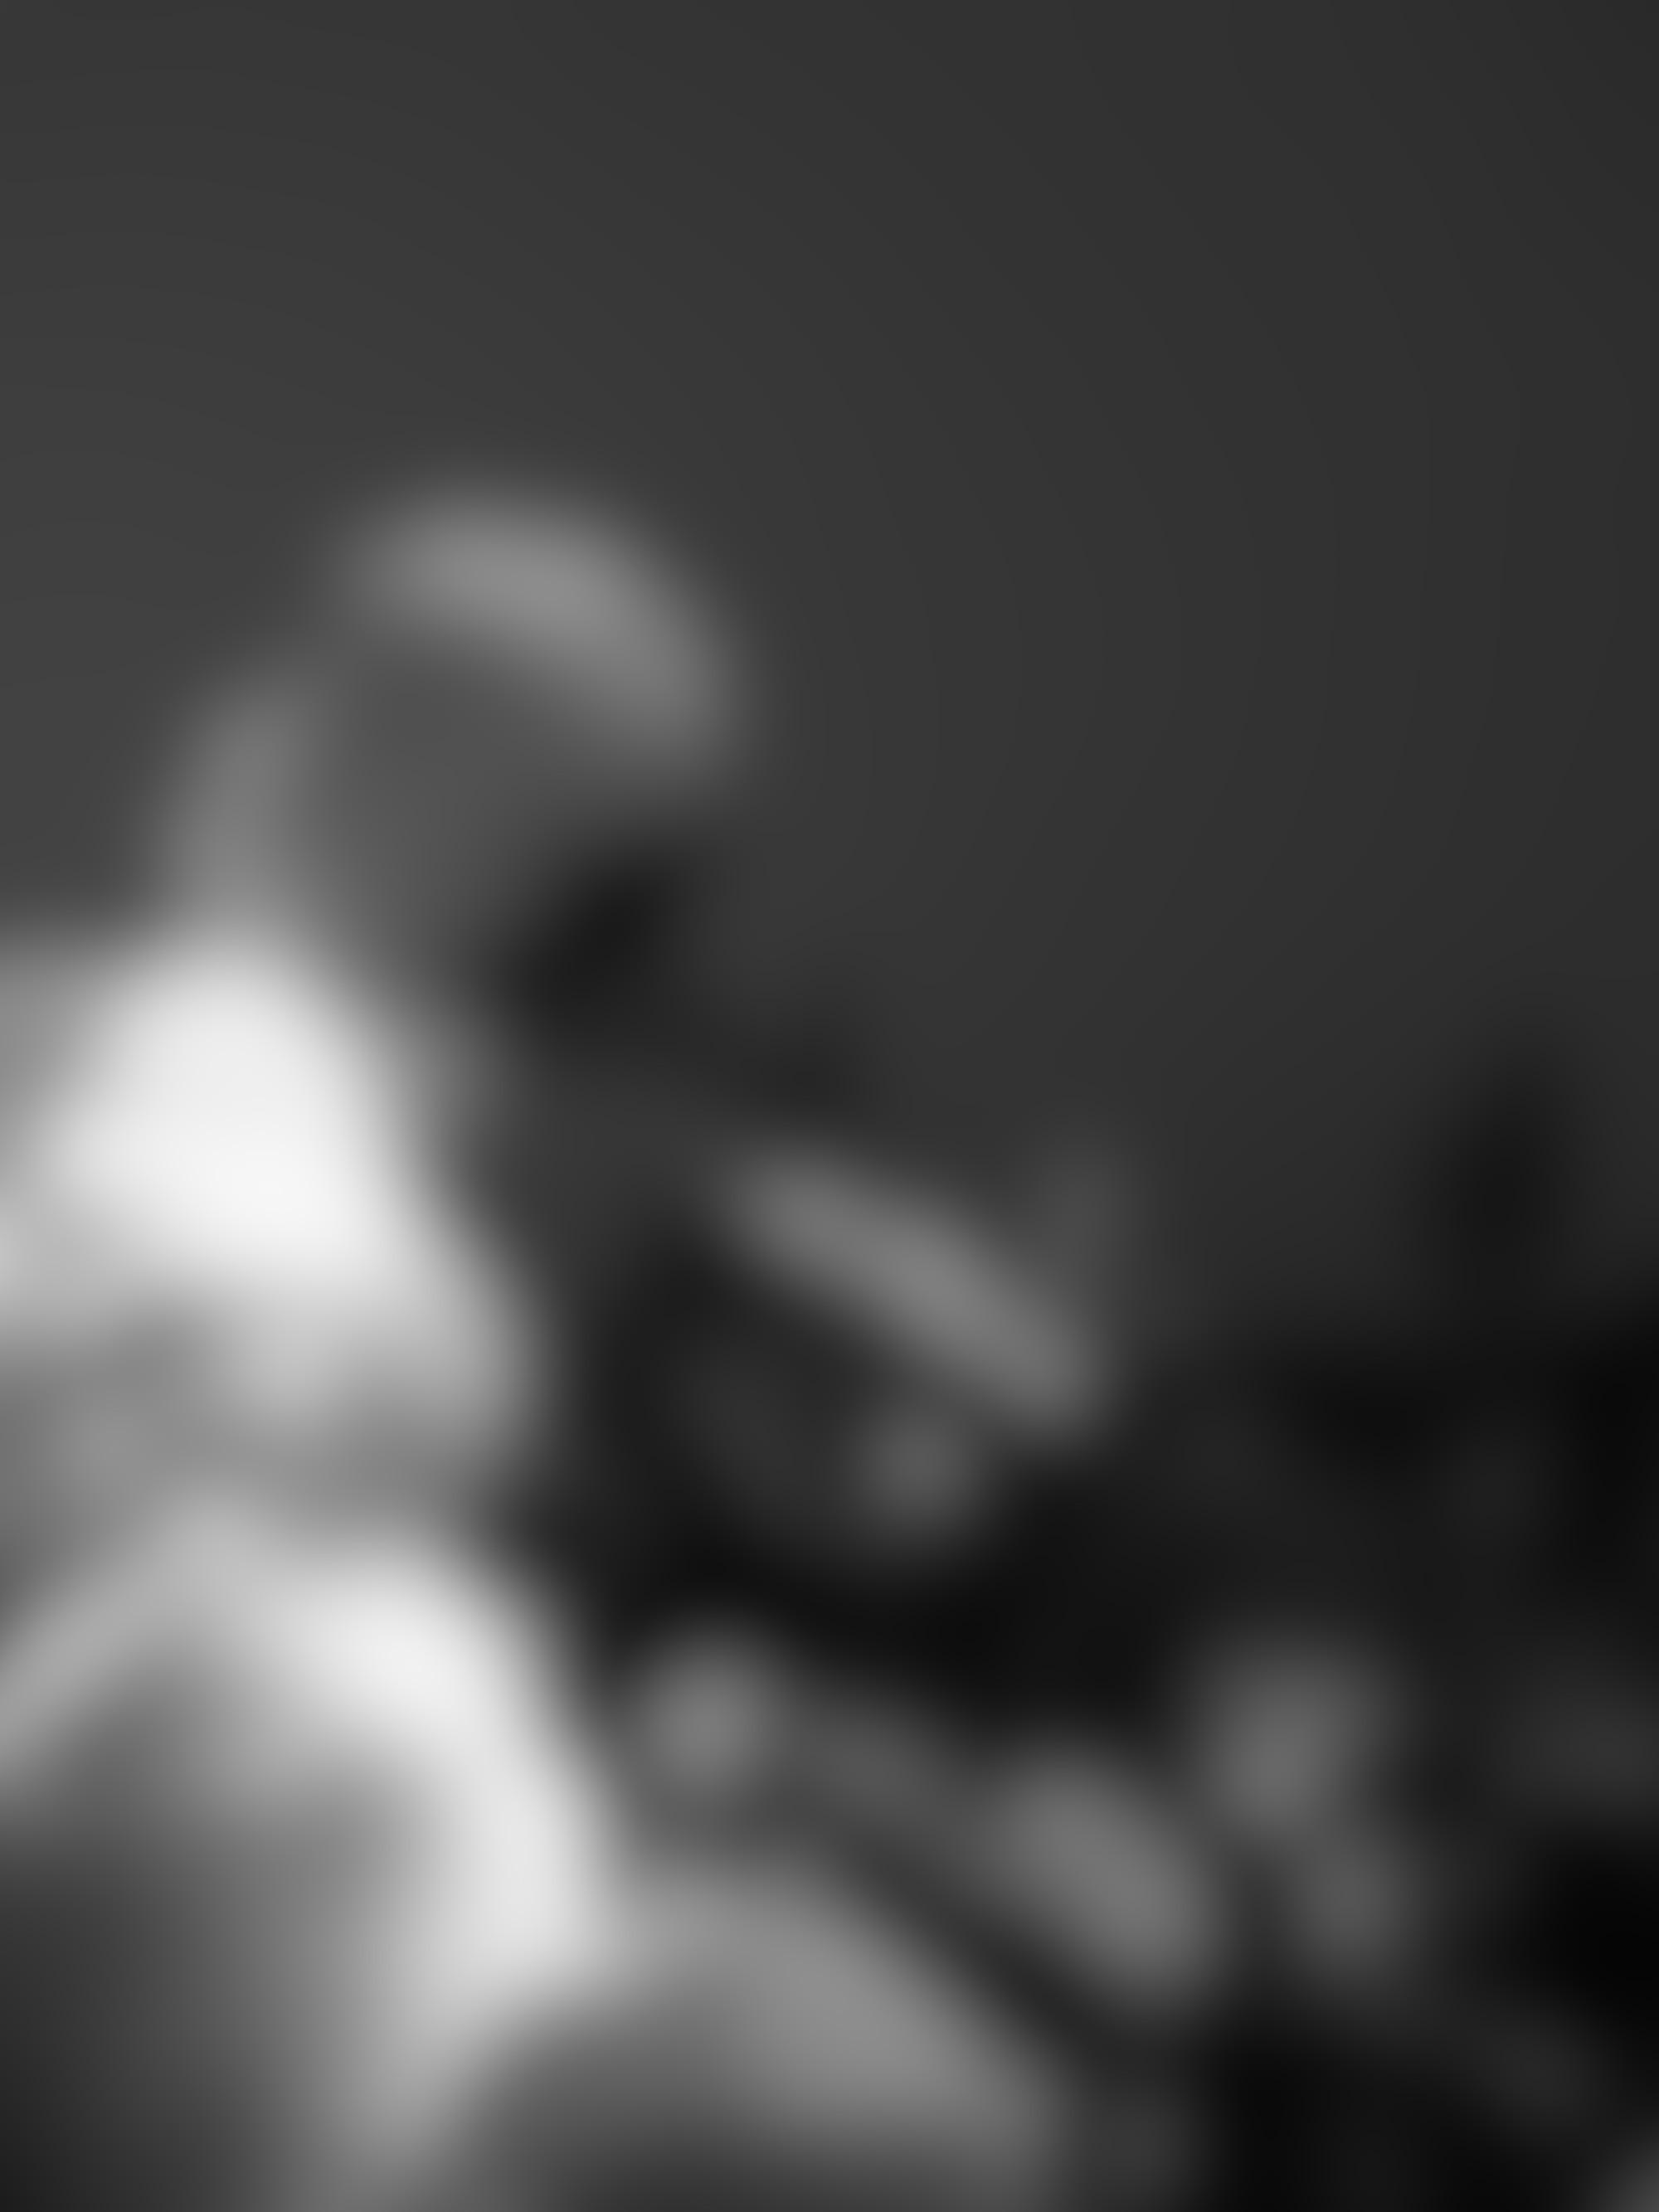 Mr Porter David Evans 04 autocompressfitresizeixlibphp 1 1 0max h2000max w3 D2000q80s52307295e1d641f83391dbc84d5563fd